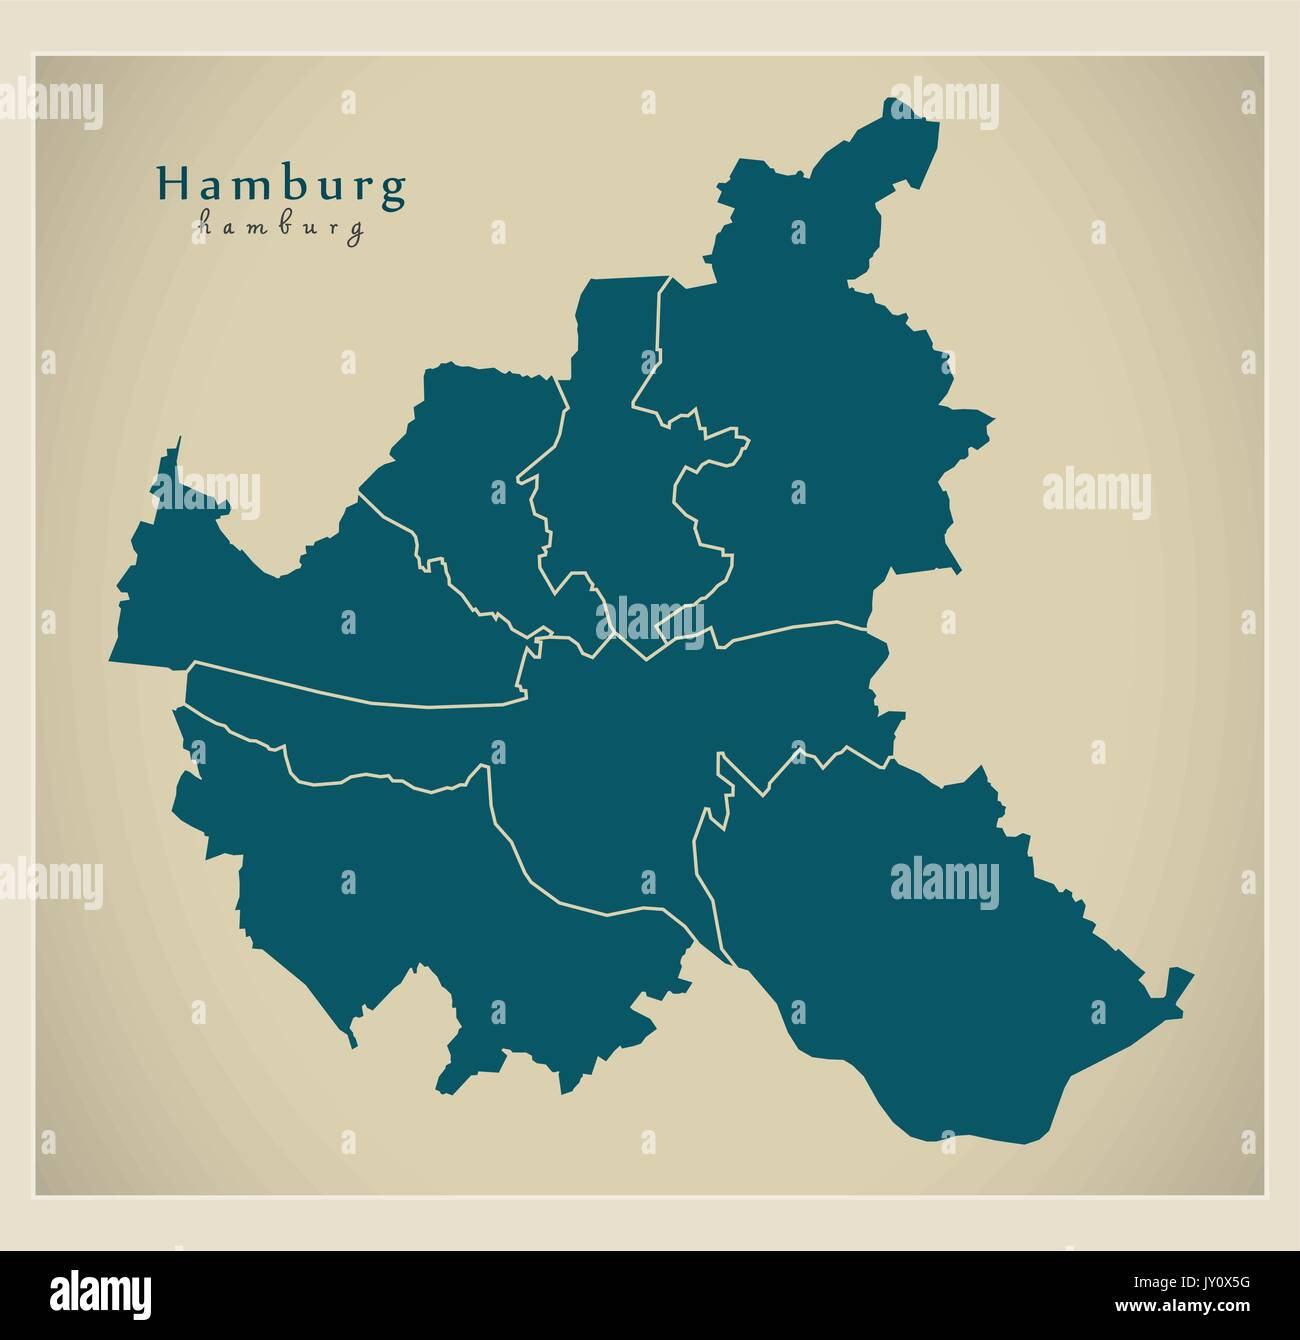 Map Of Germany Hamburg.Modern City Map Hamburg City Of Germany With Boroughs De Stock